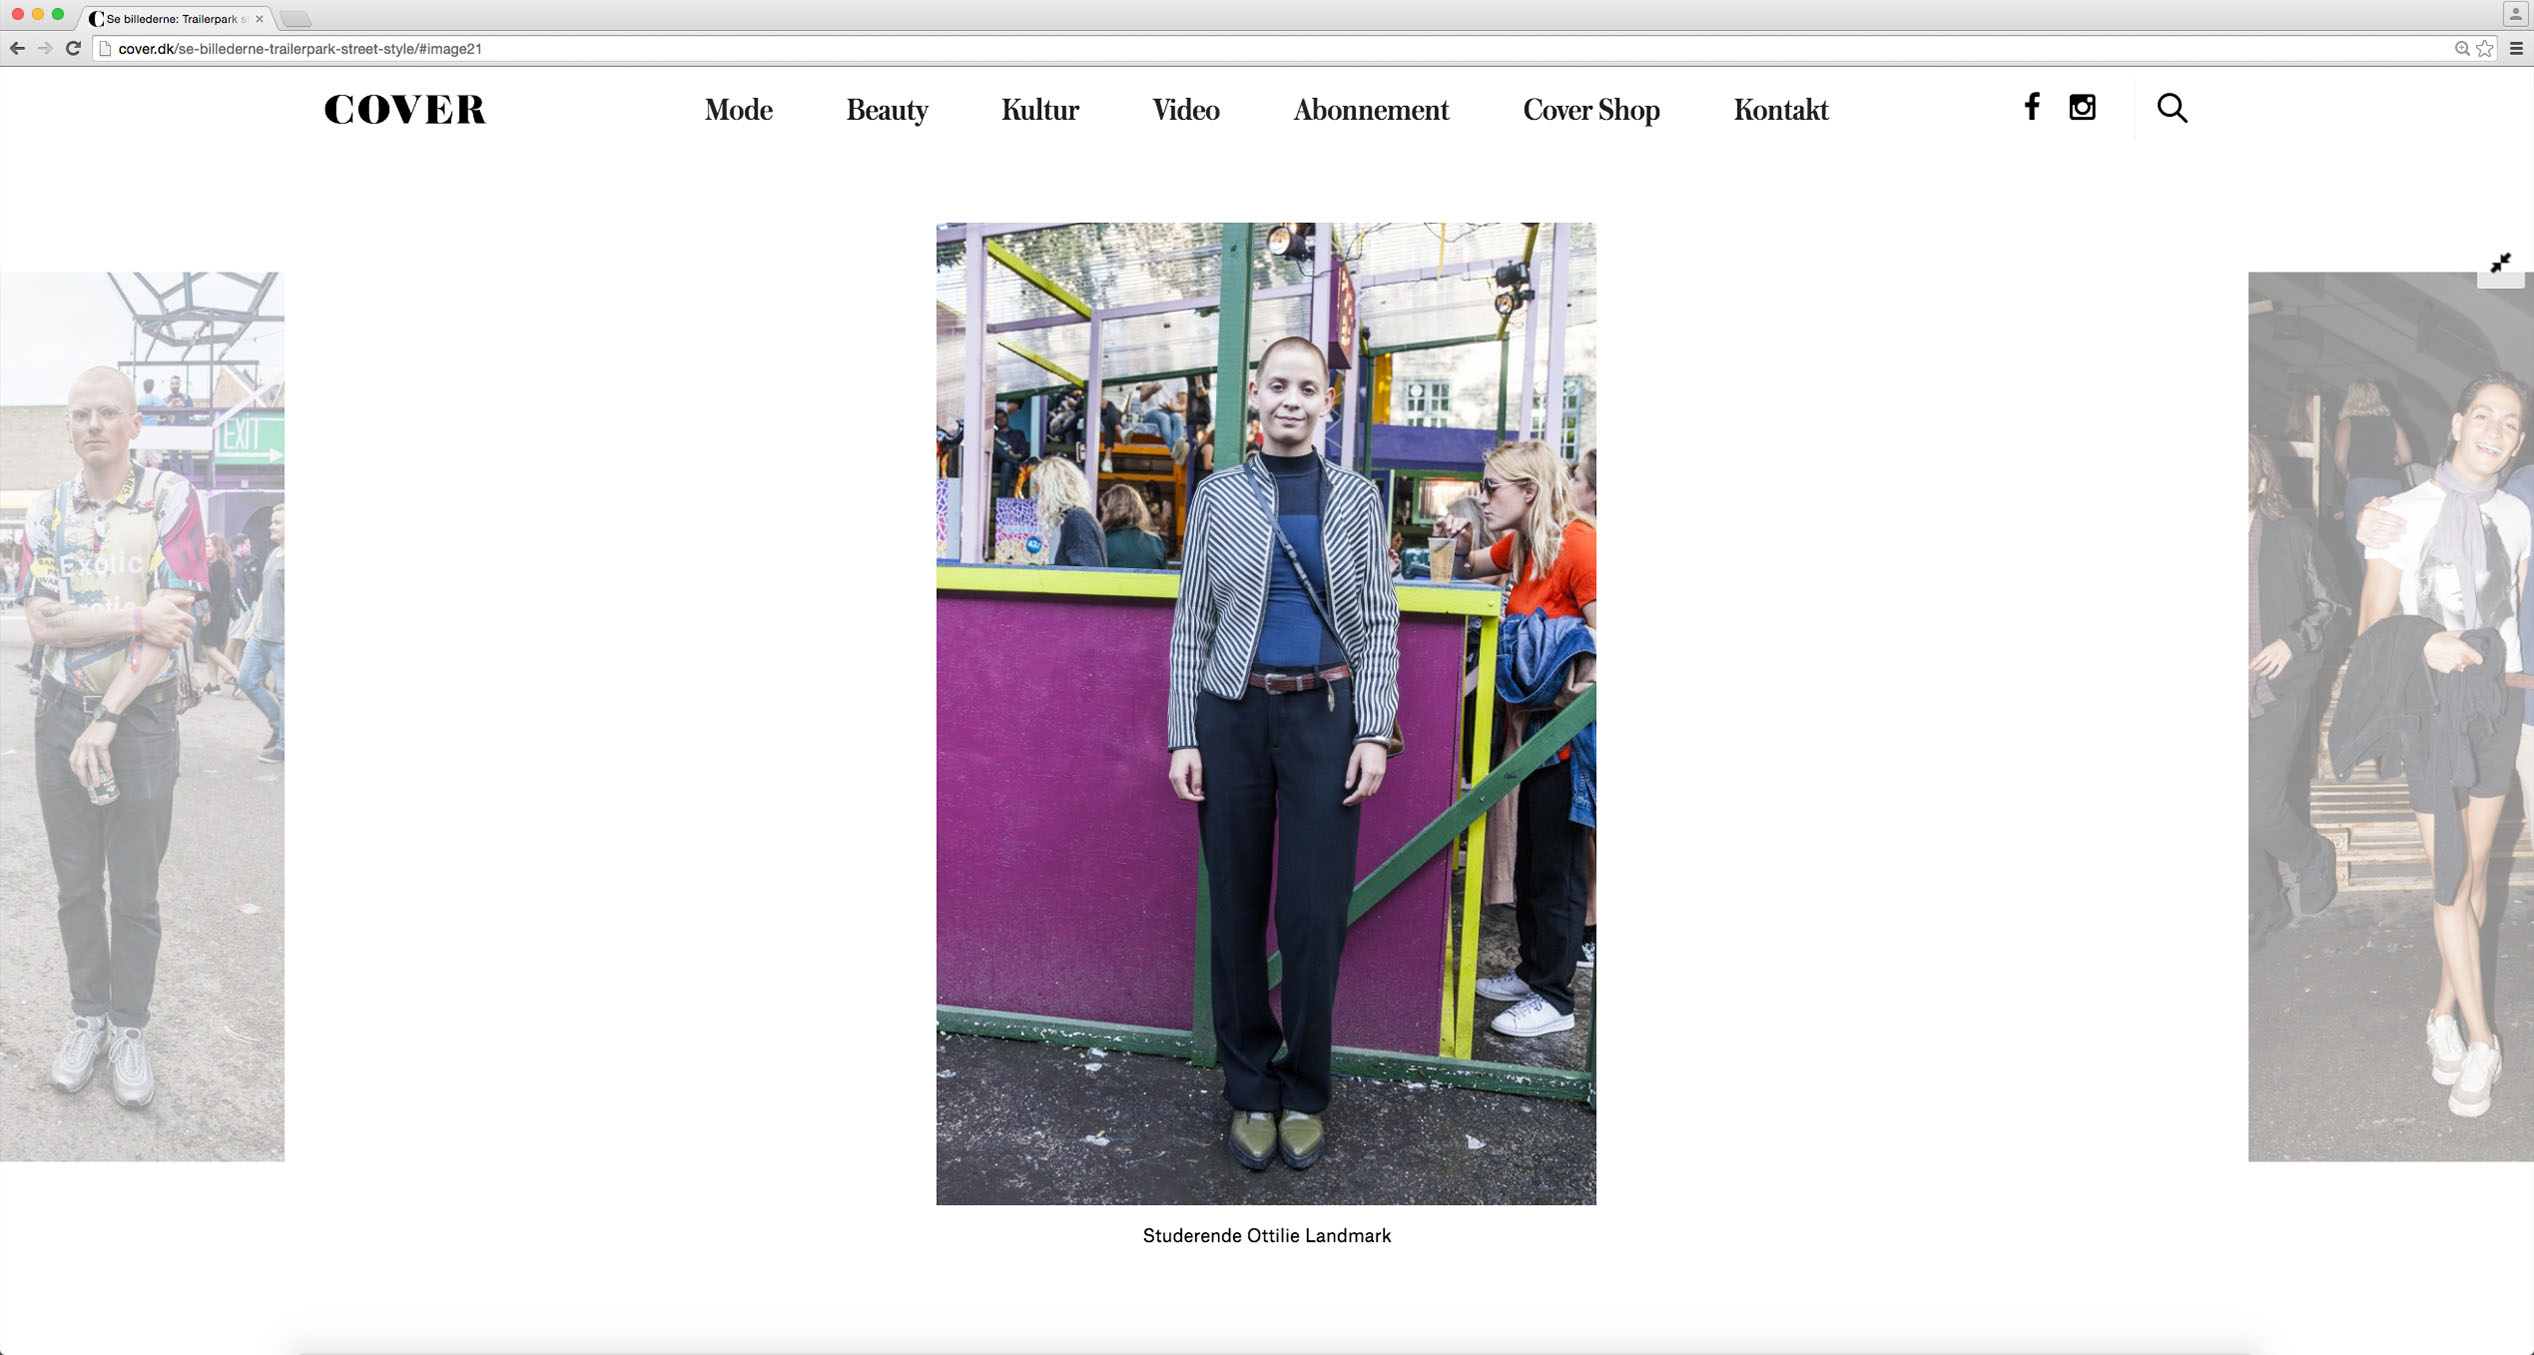 Streetstyle_CoverMagazine_TrailerparkFestival2016_21